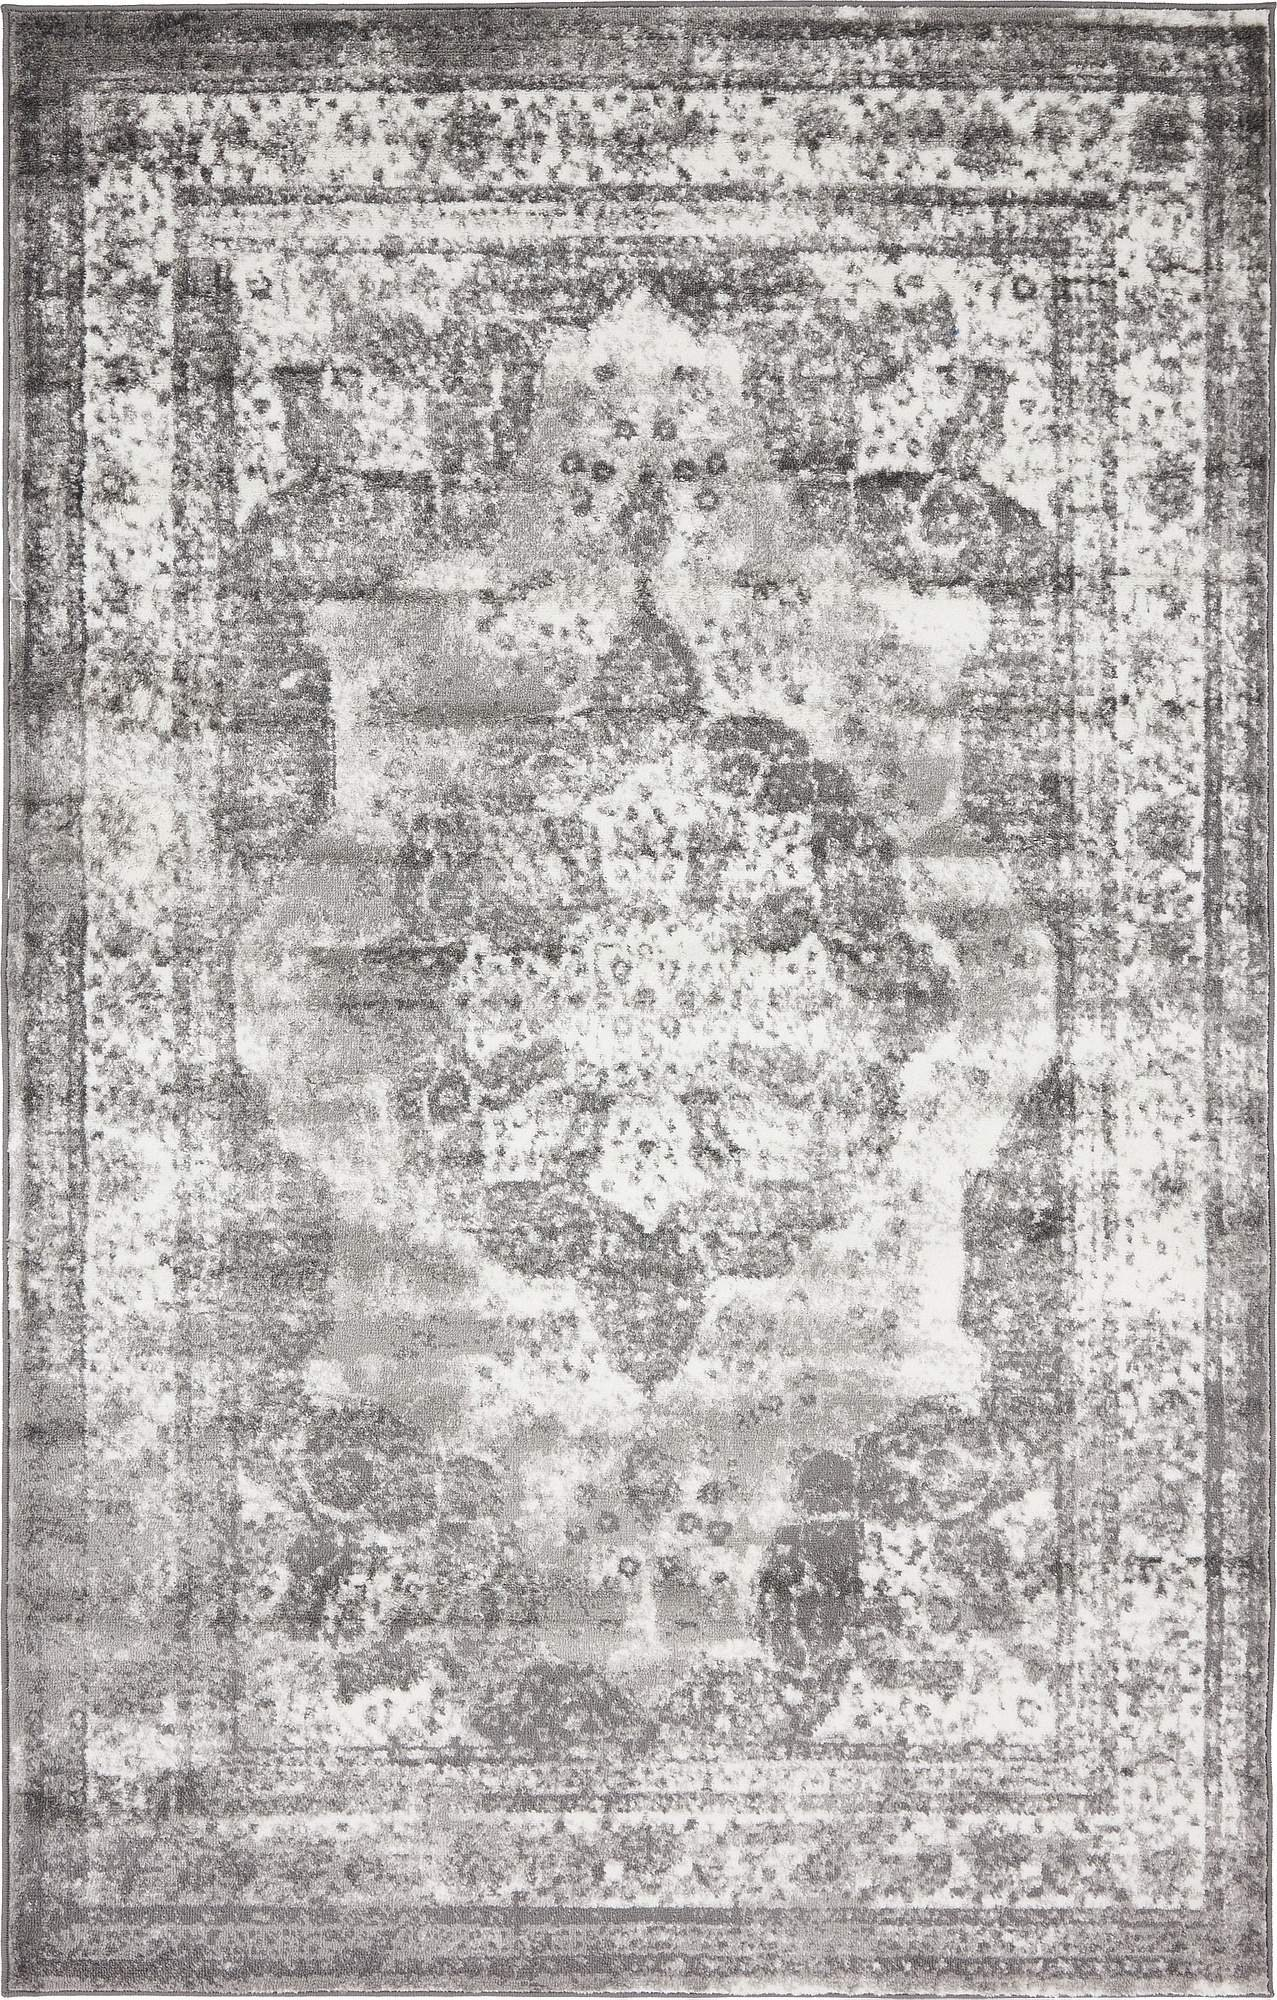 Unique Loom 3134092 Area Rug, 5' x 8' Rectangle, Gray